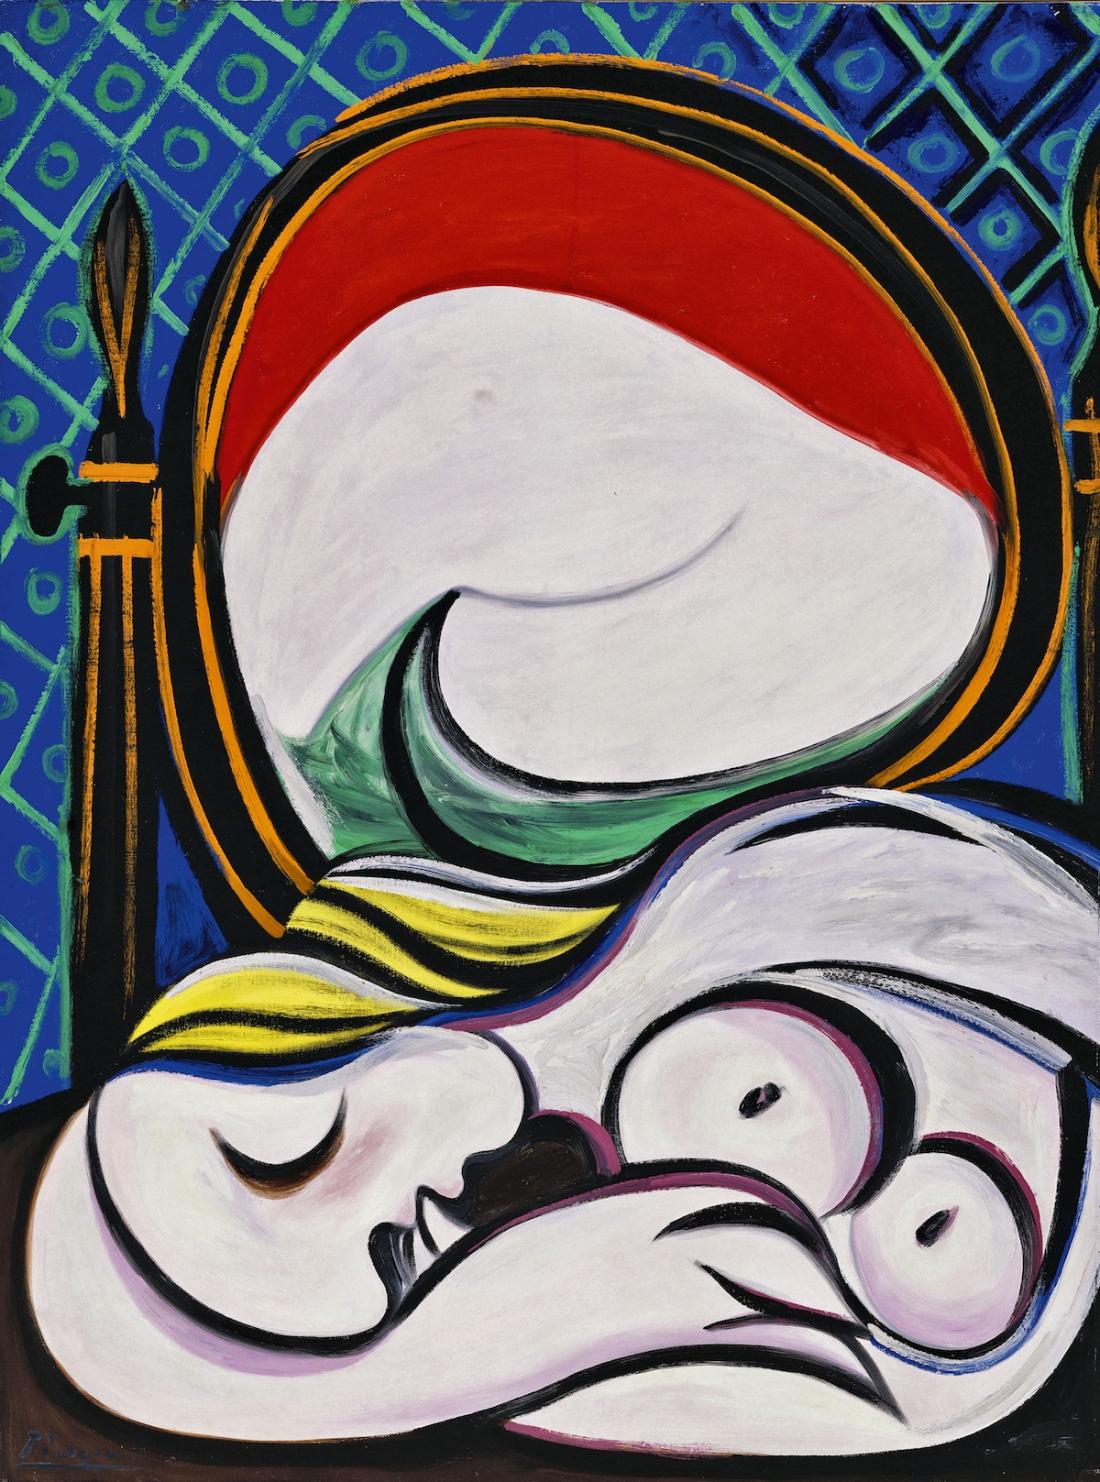 Pablo Picasso The Mirror (Le miroir) 1932 Oil paint on canvas 1300 x 970 mm Private Collection © Succession Picasso/ DACS London, 2017